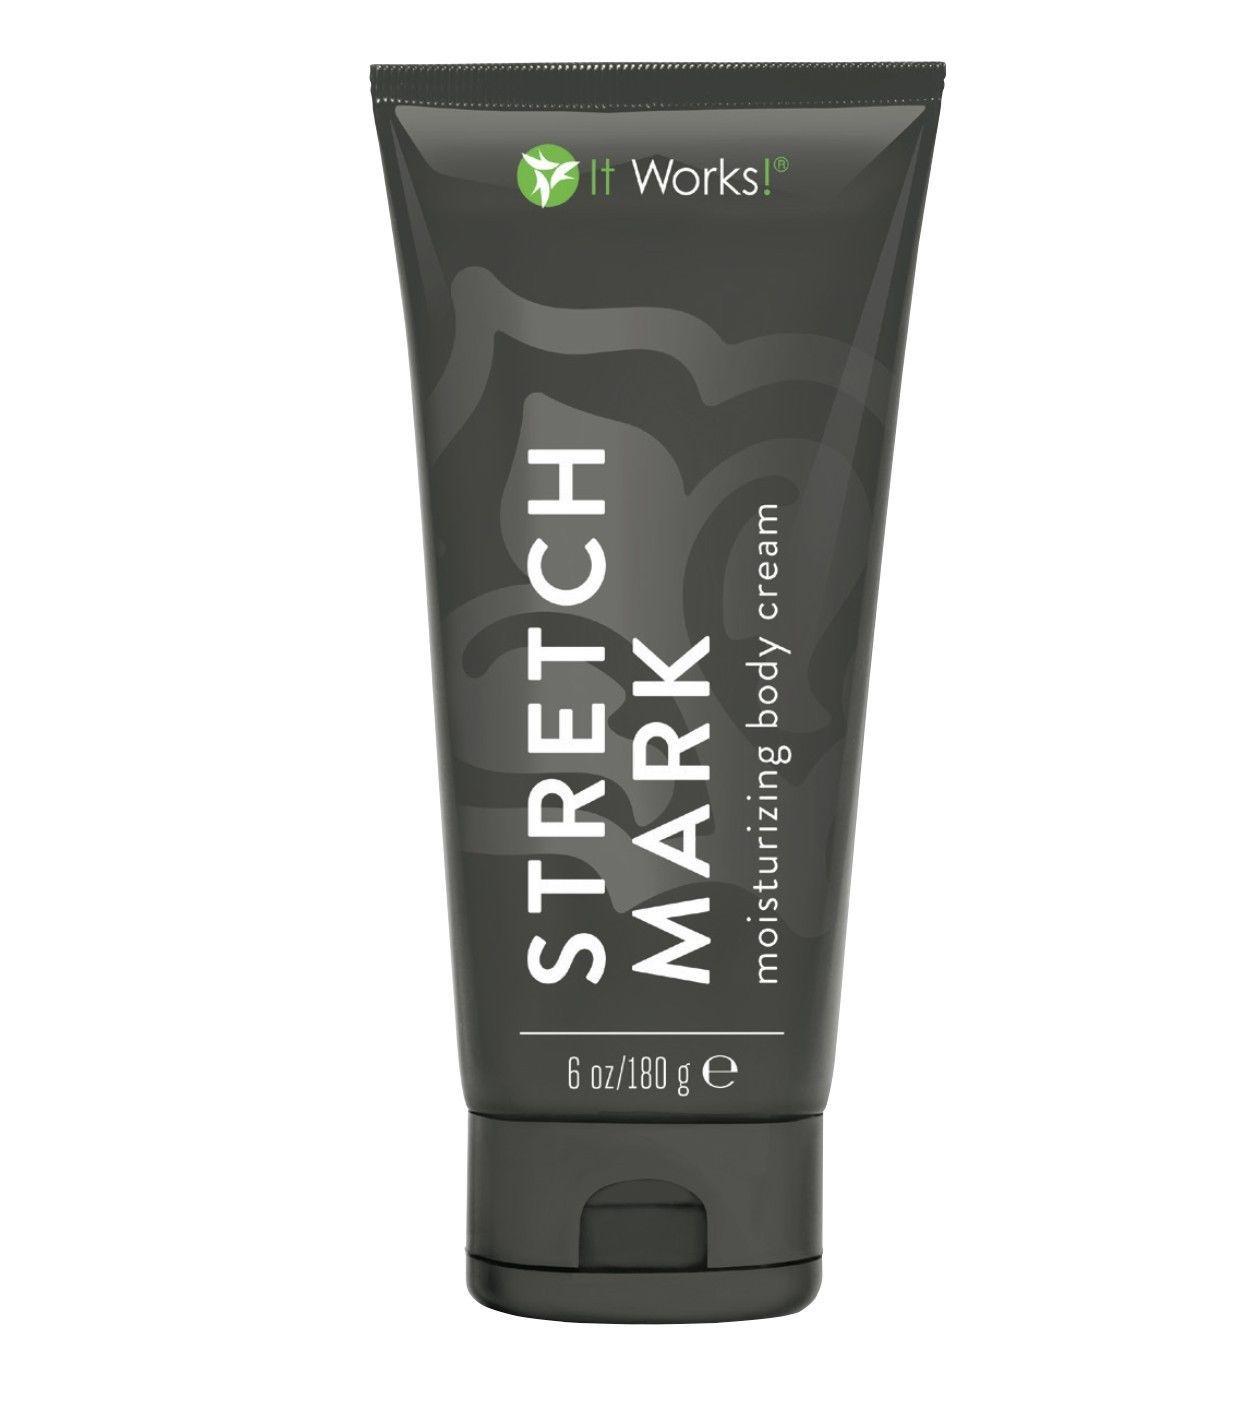 Scar and Stretch Mark Reducers It Works Stretch Mark Cream ue BUY